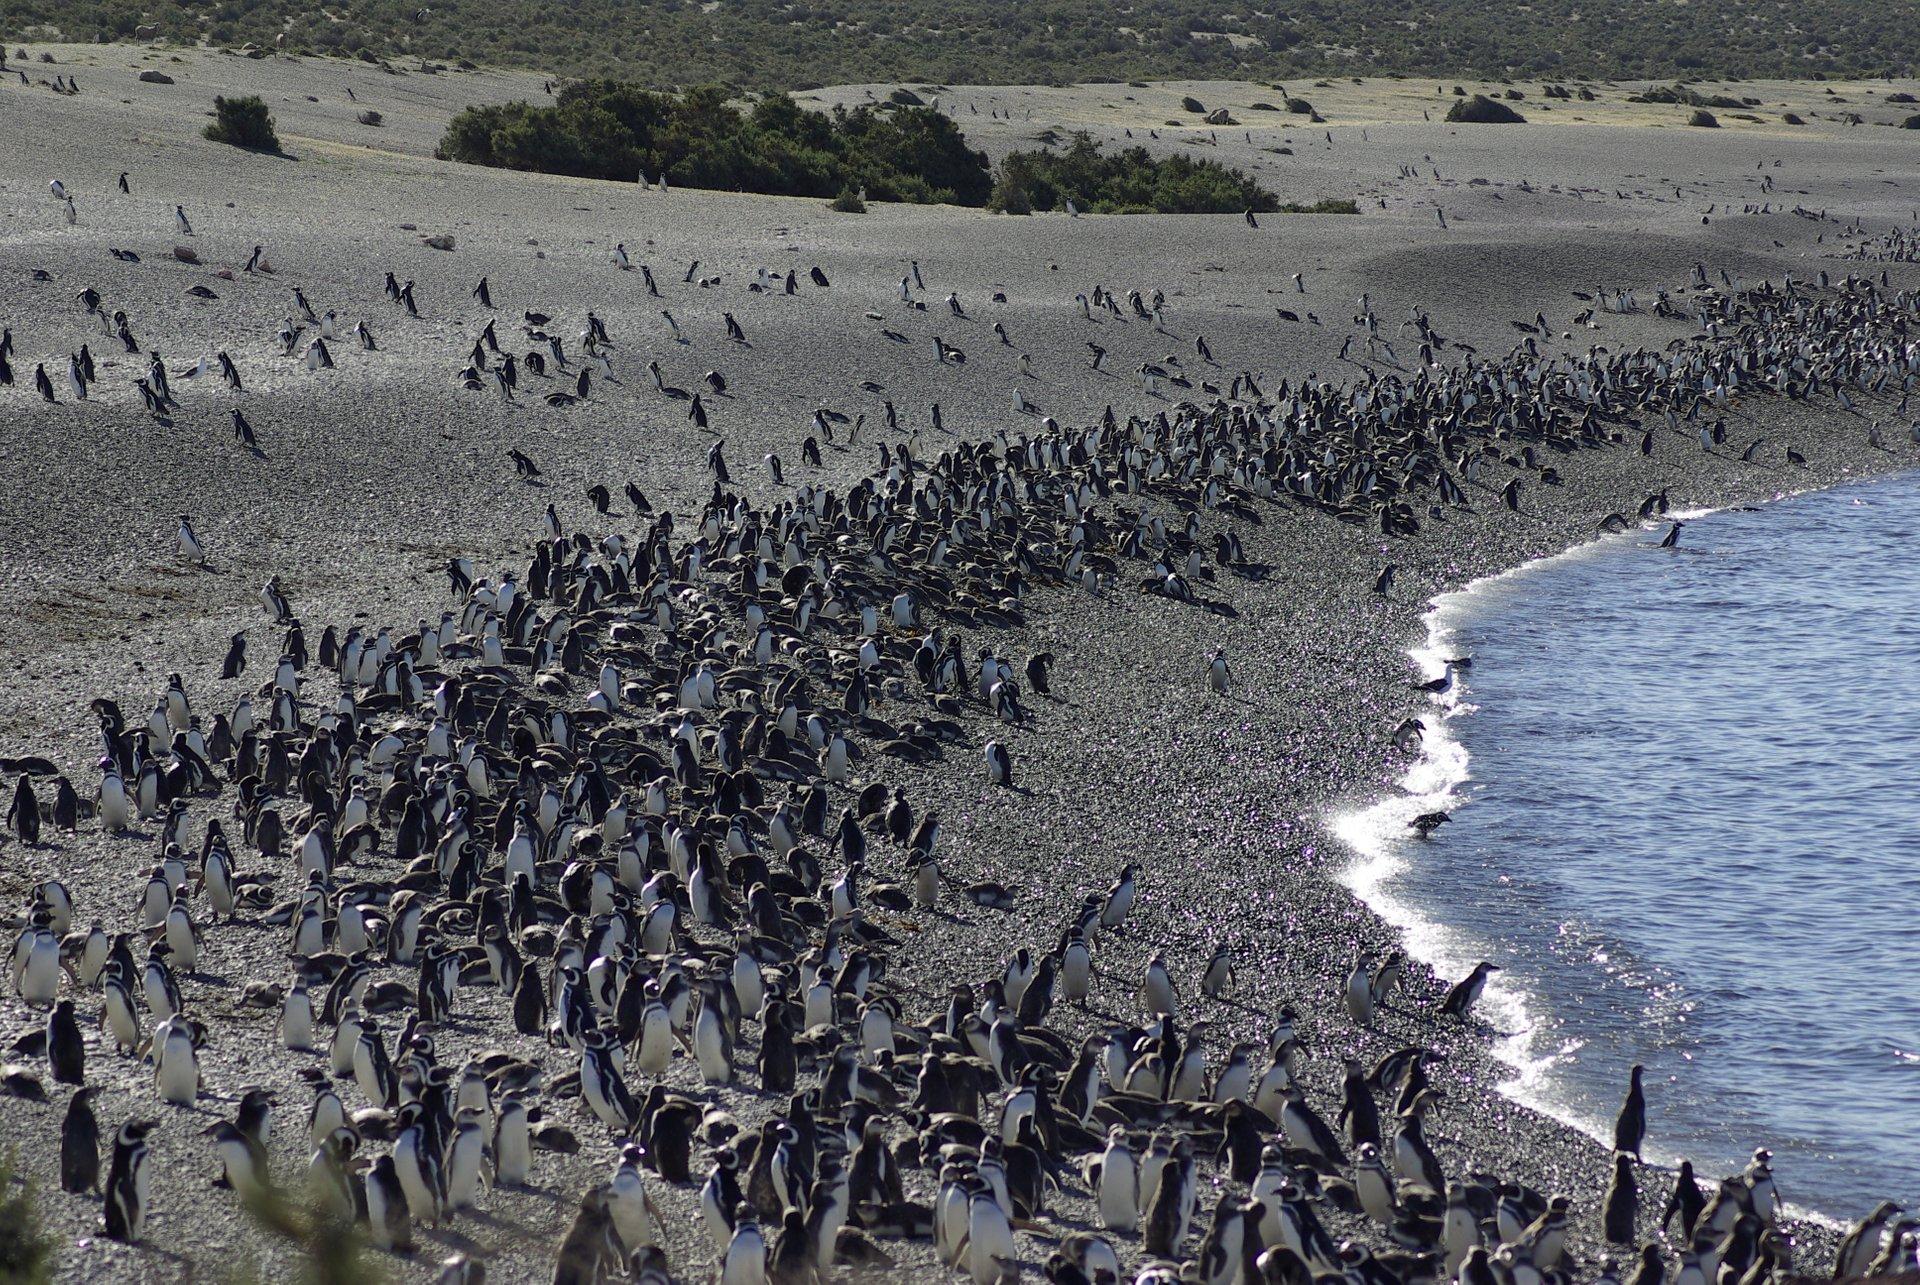 Penguins in Argentina - Best Season 2020